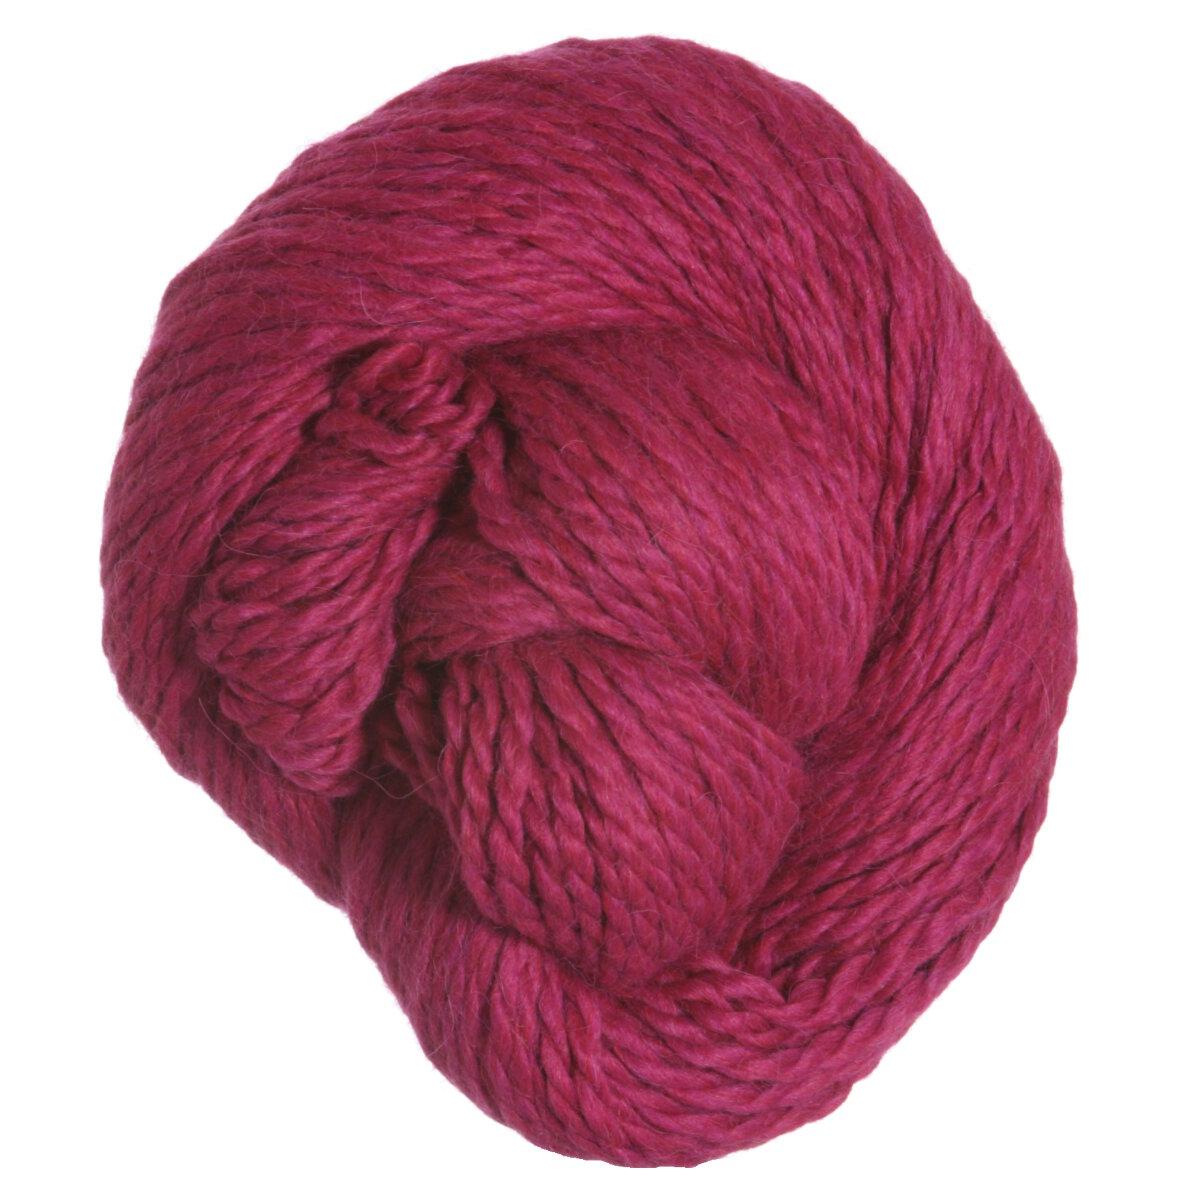 Cascade Baby Alpaca Chunky Yarn 551 Hot Rod Pink At